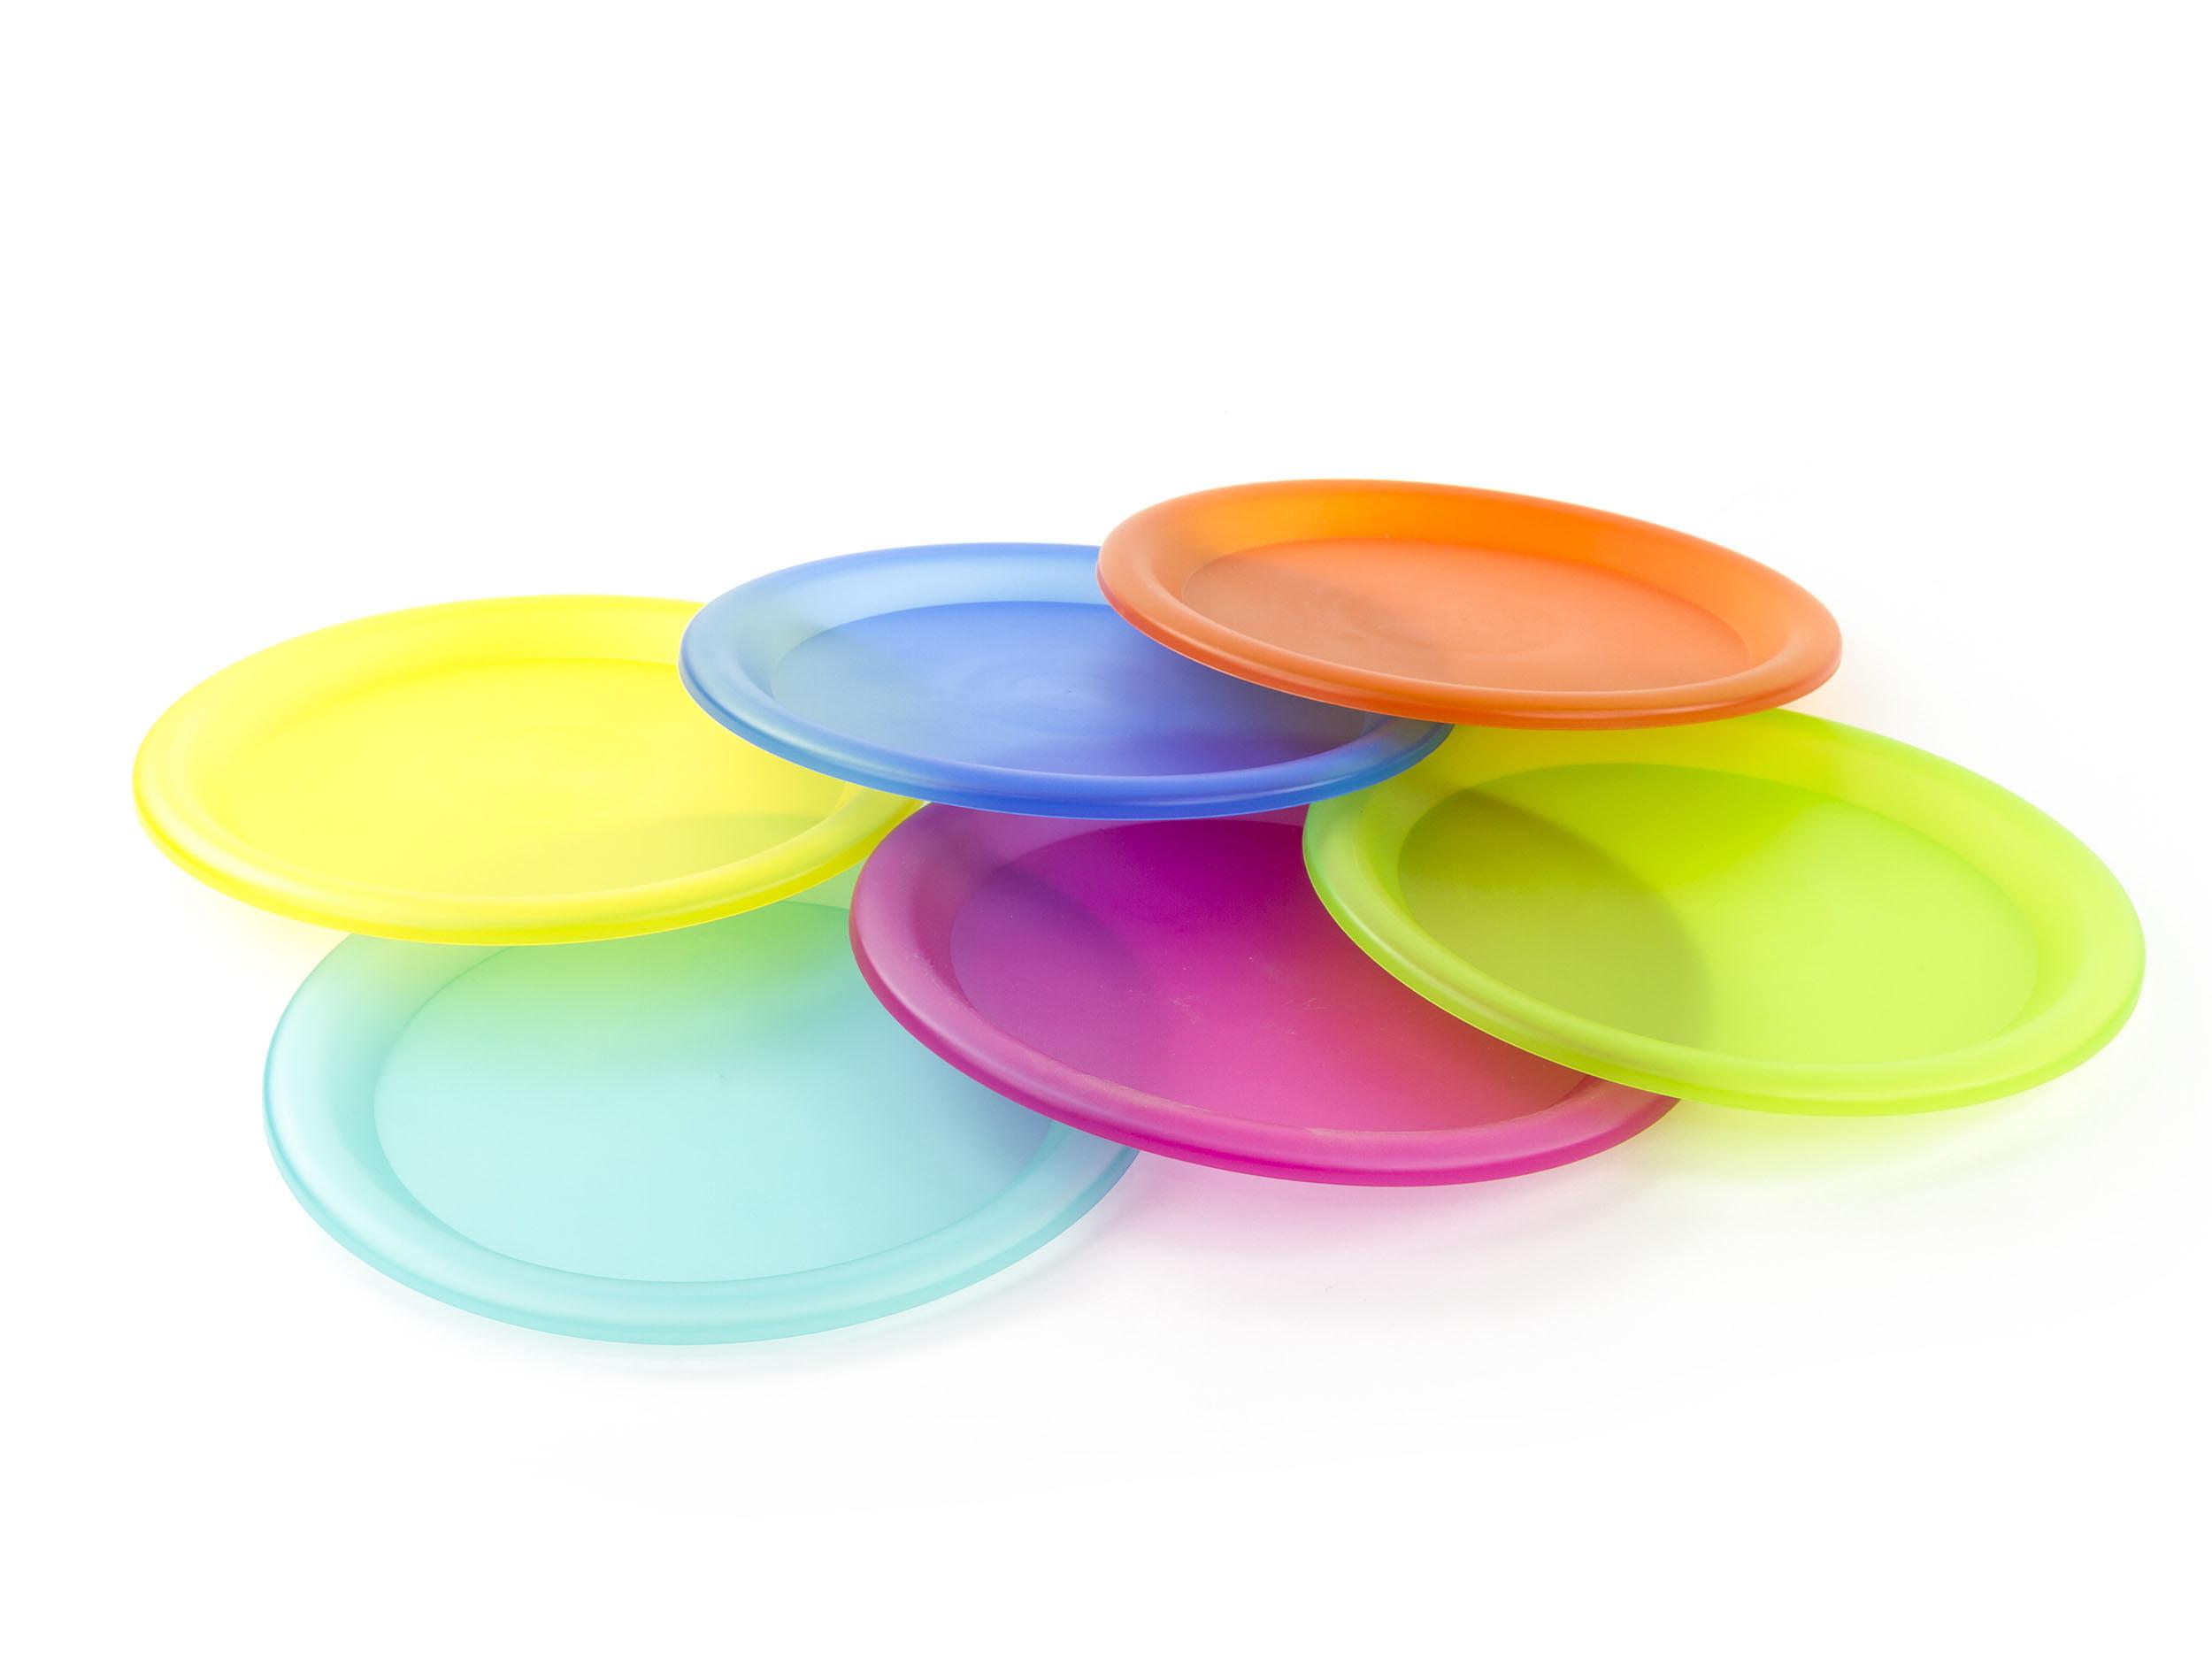 6 Pcs Colorful Plastic Plates Reusable Plastic Party Plates - Walmart.com  sc 1 st  Walmart.com & 6 Pcs Colorful Plastic Plates Reusable Plastic Party Plates ...